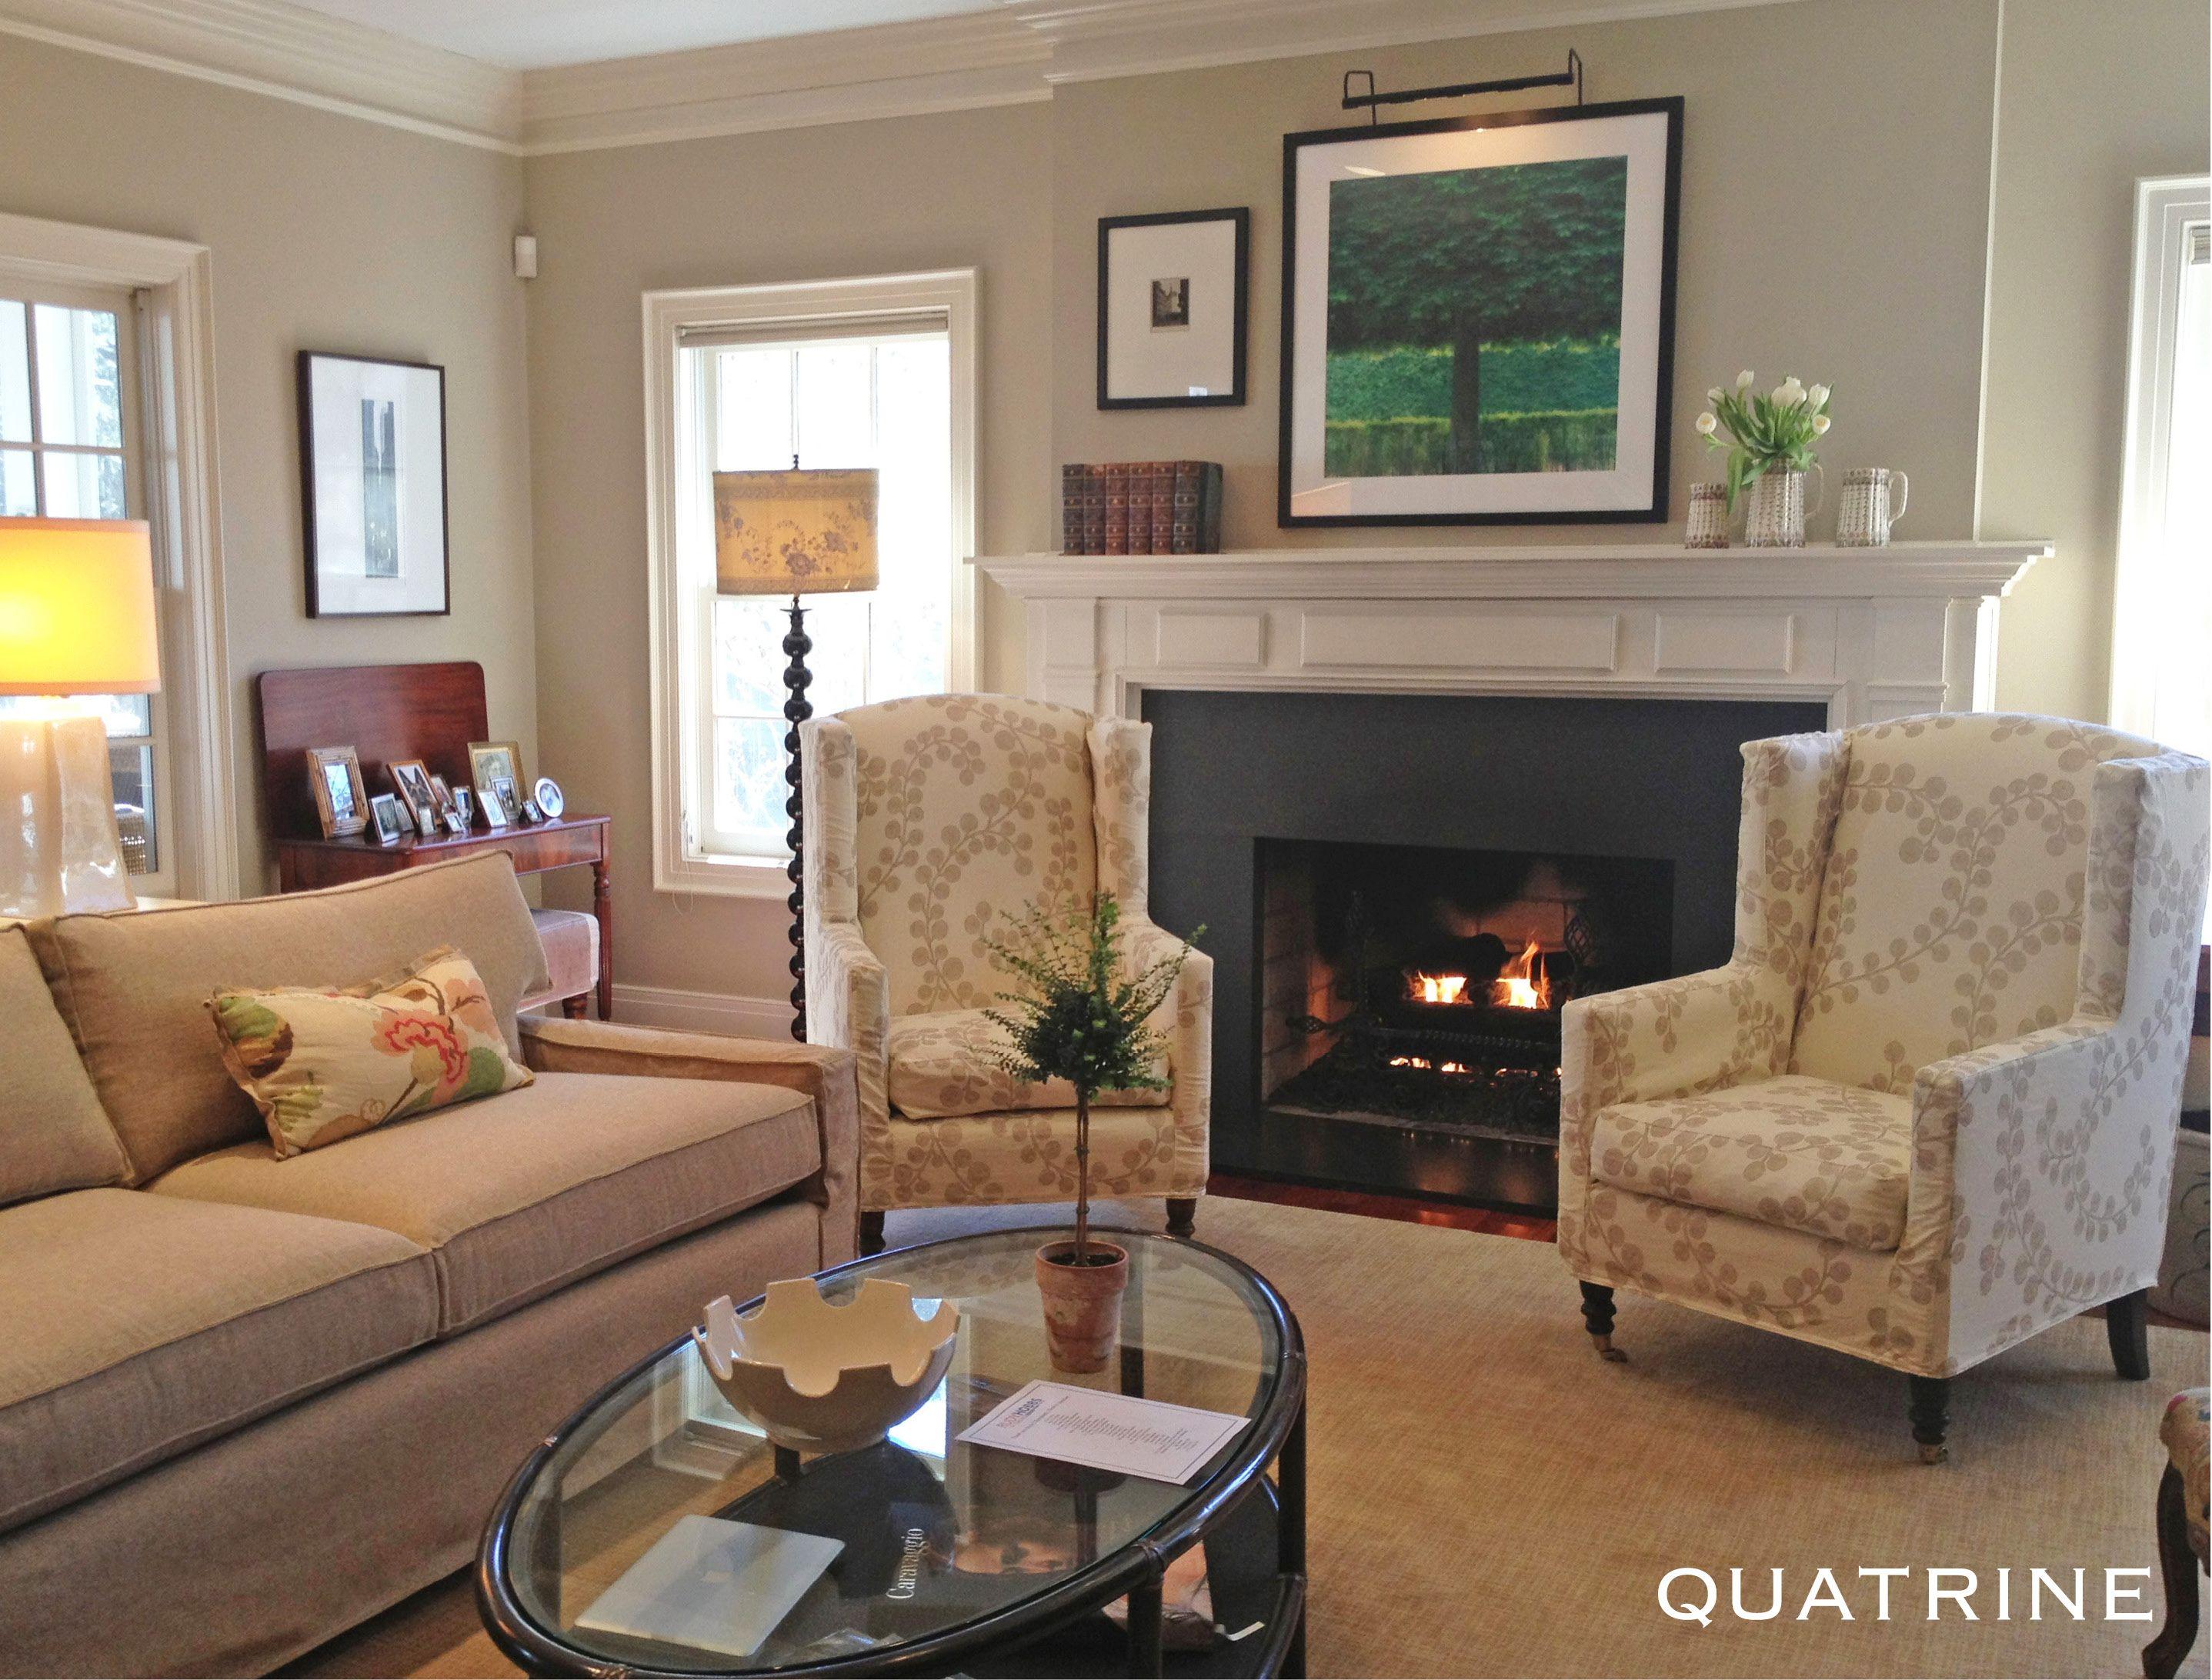 quatrine furniture. Beautiful Michigan Home Featuring Two Modern Wingback Chairs In Berry Branch/Gold And A New Quatrine Furniture I